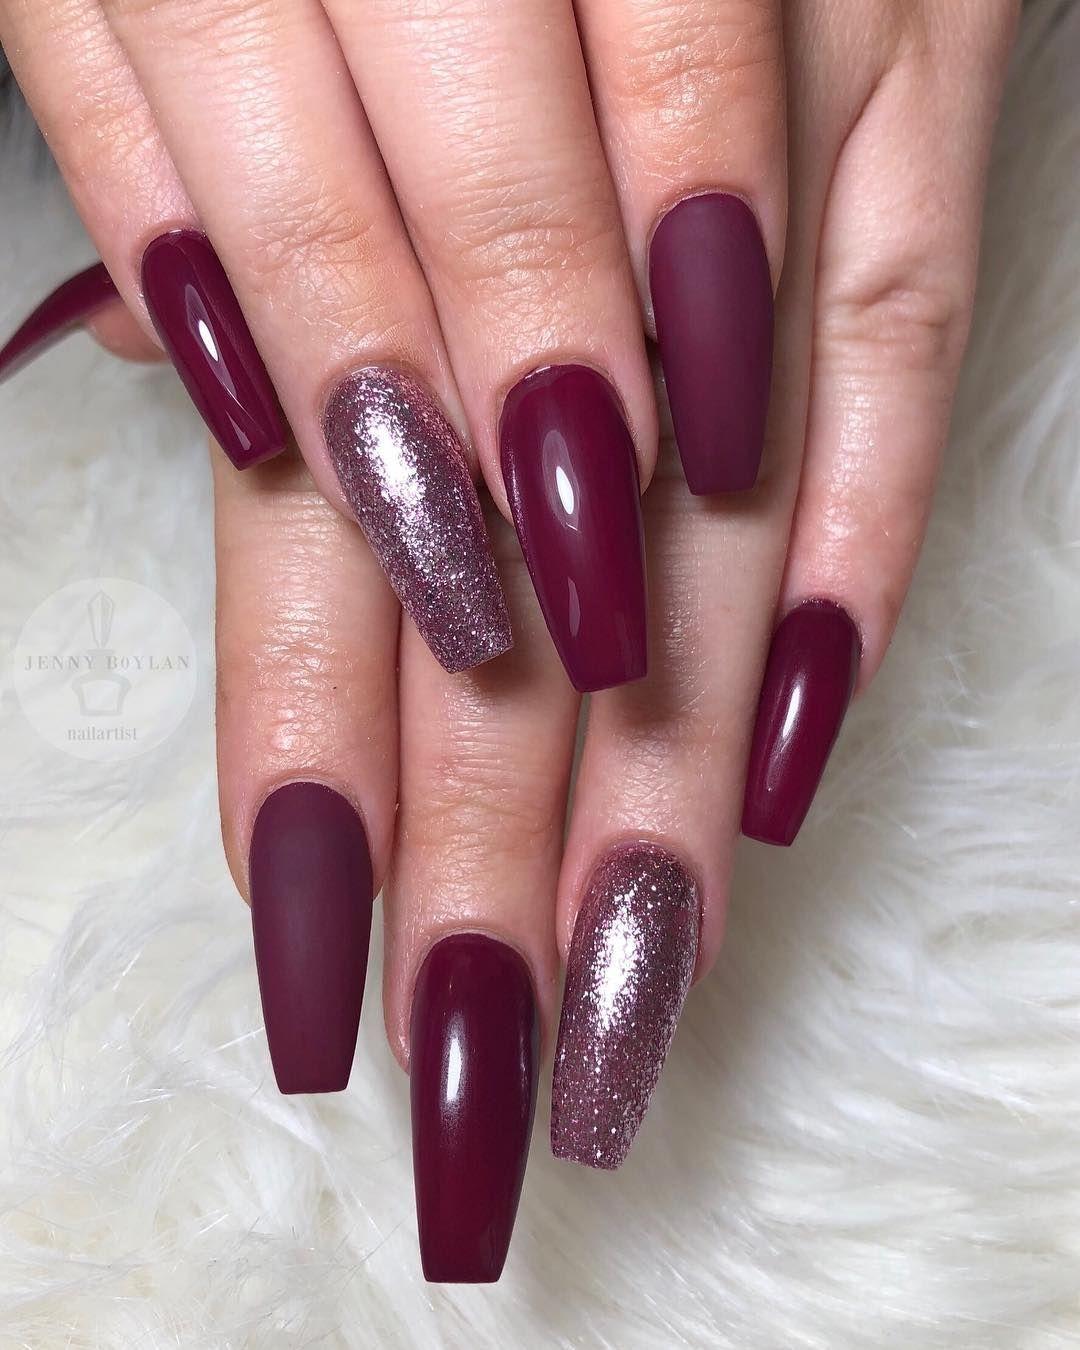 Dark purple and glitter nail art design